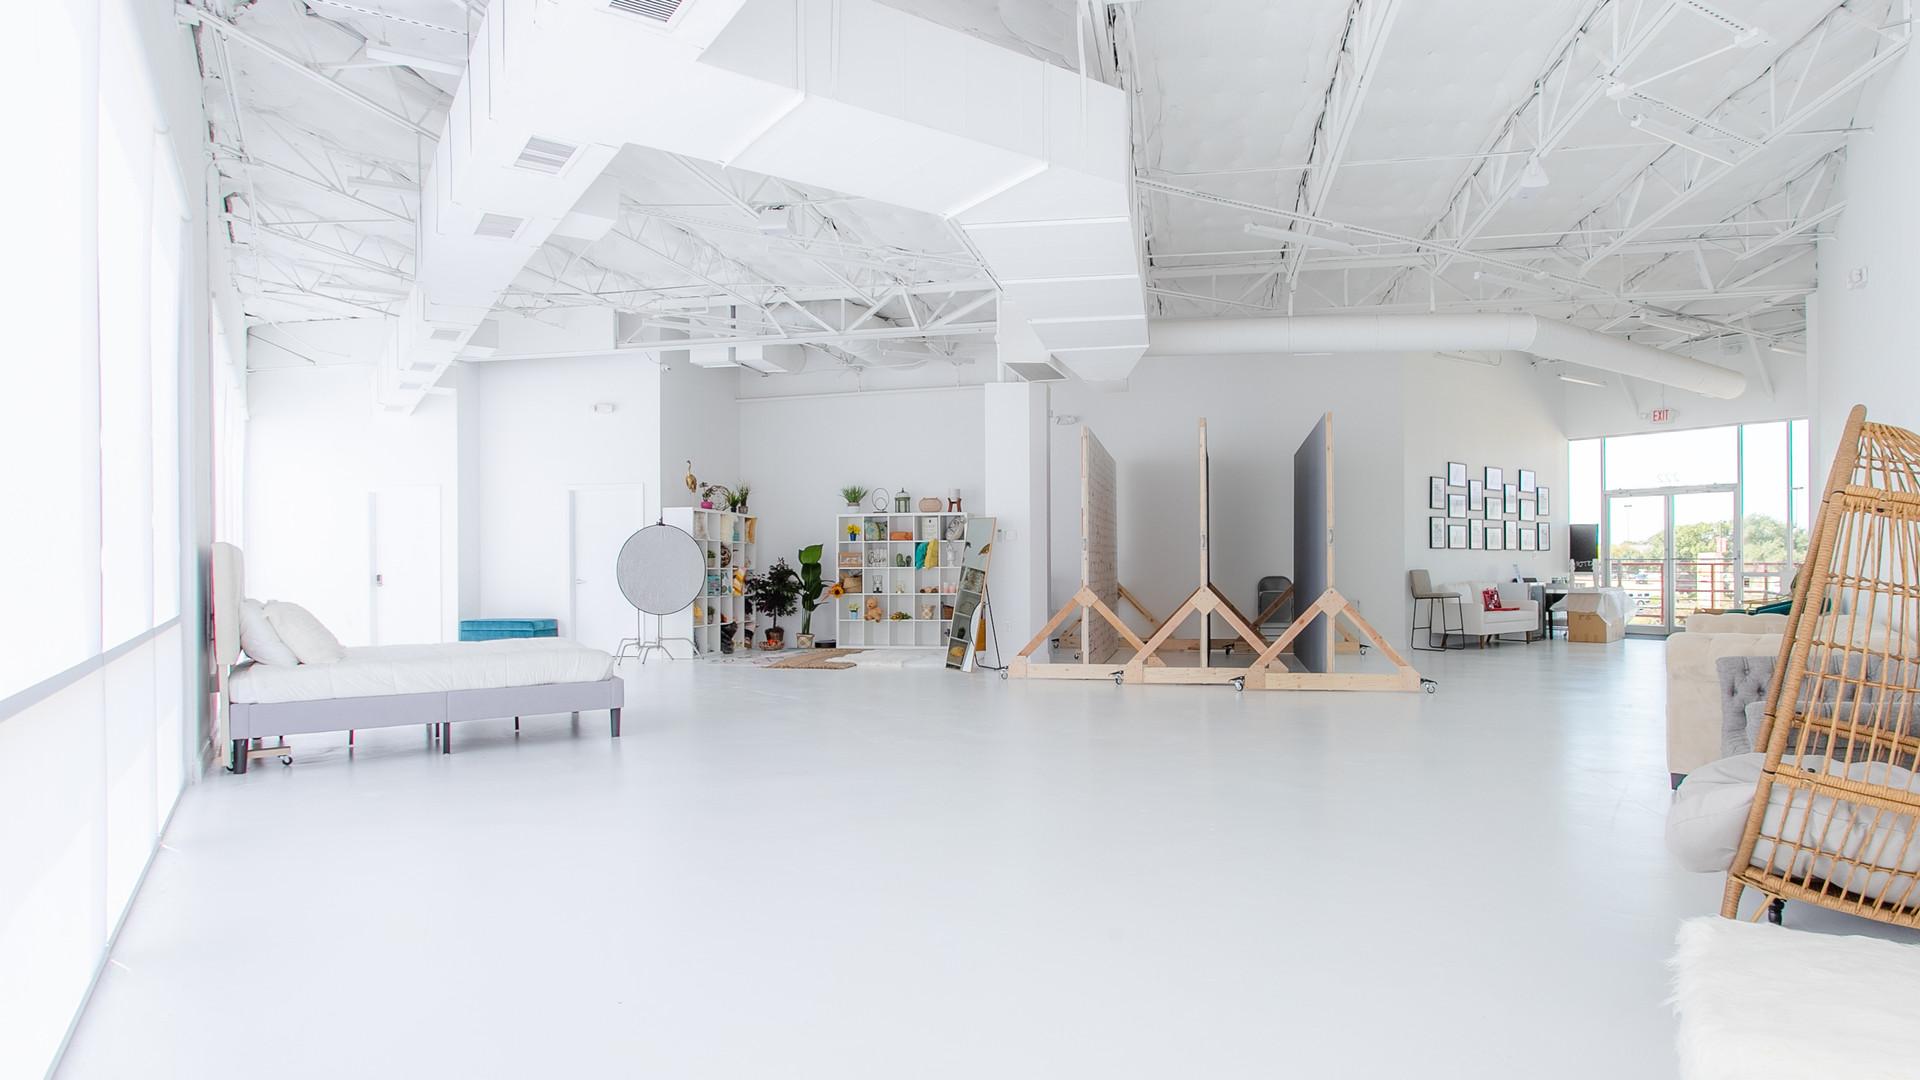 Black and Light Studio Space